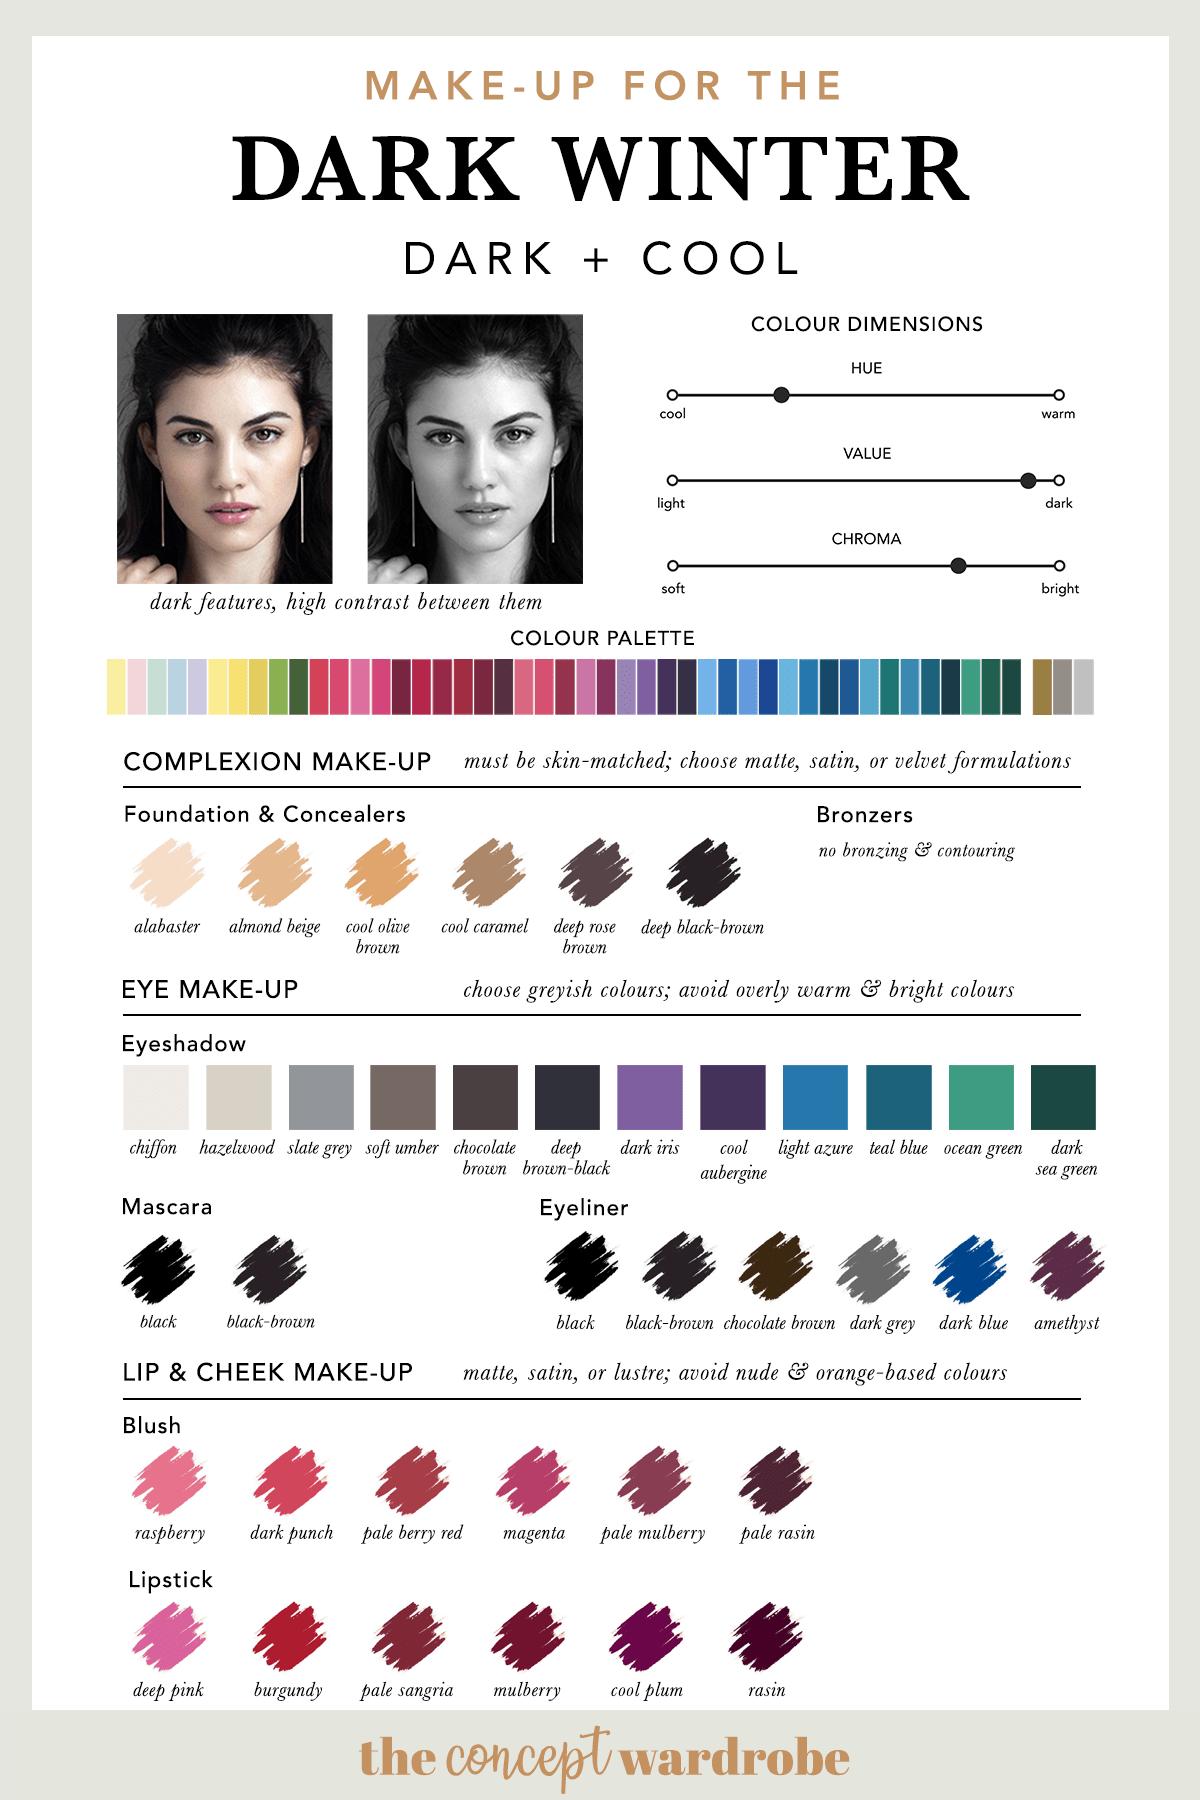 The Dark Winter Make-up Palette | the concept wardrobe